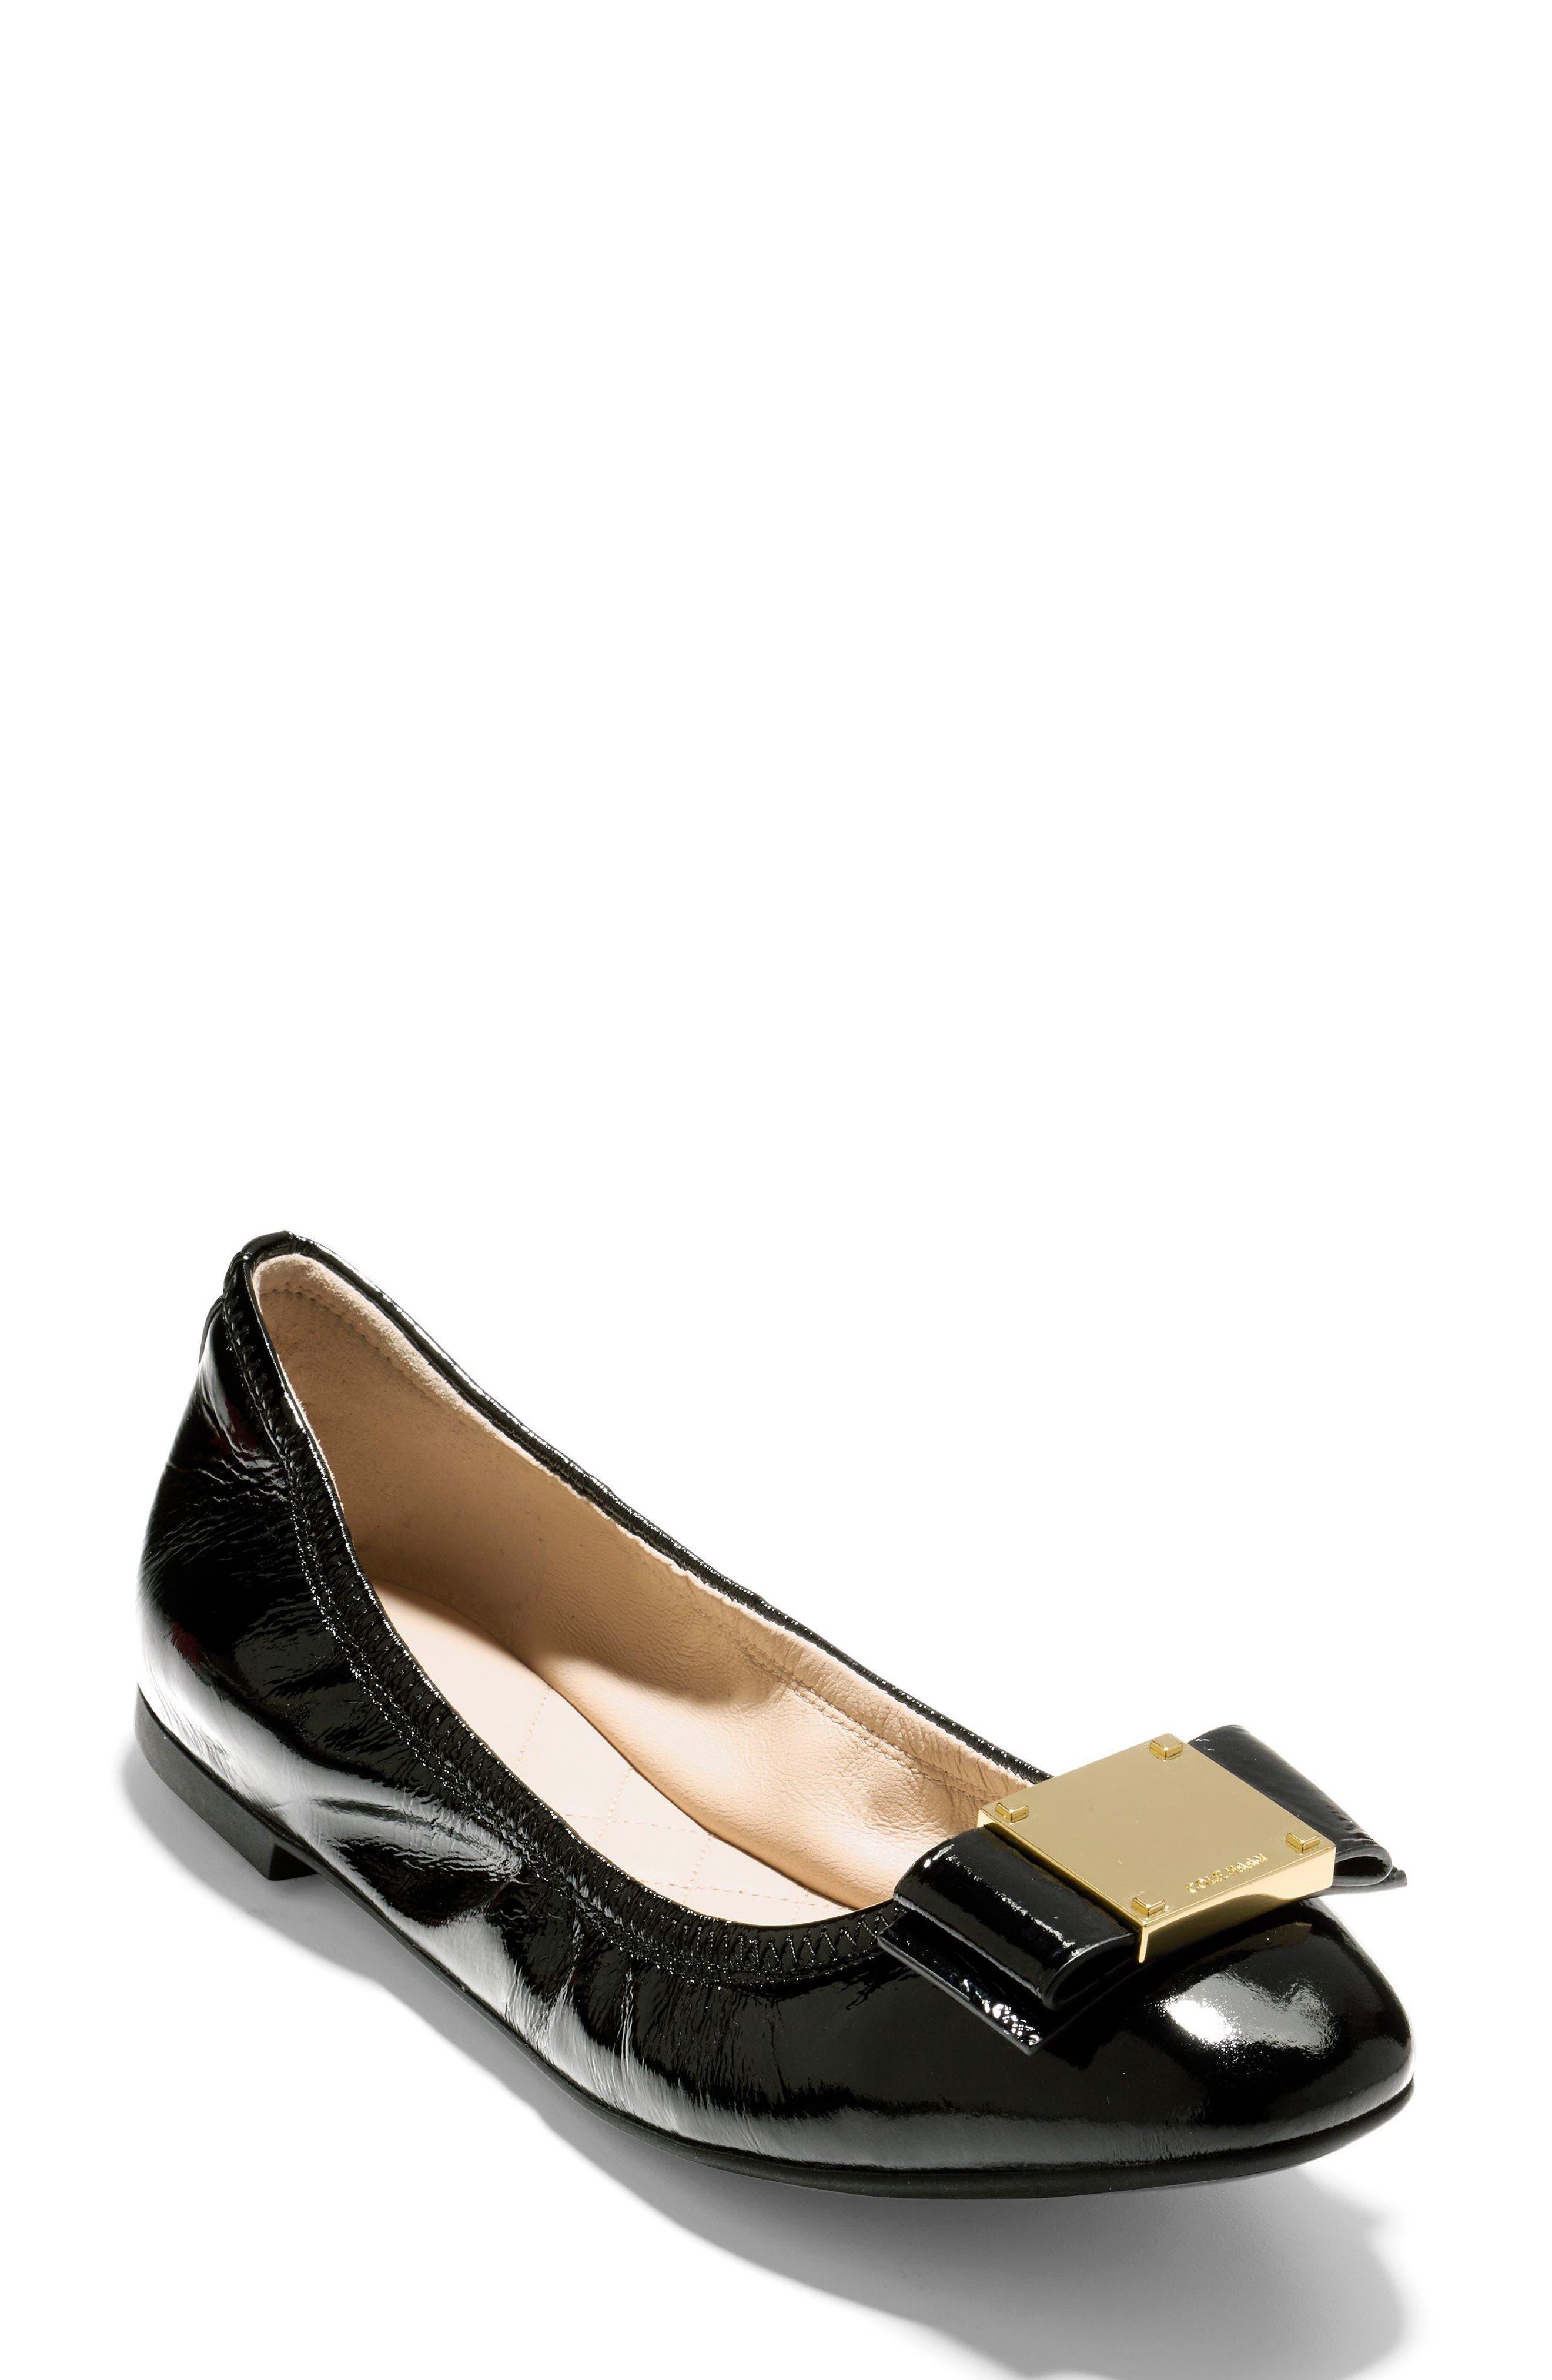 Tali Modern Bow Ballet Flat,                         Main,                         color, 001